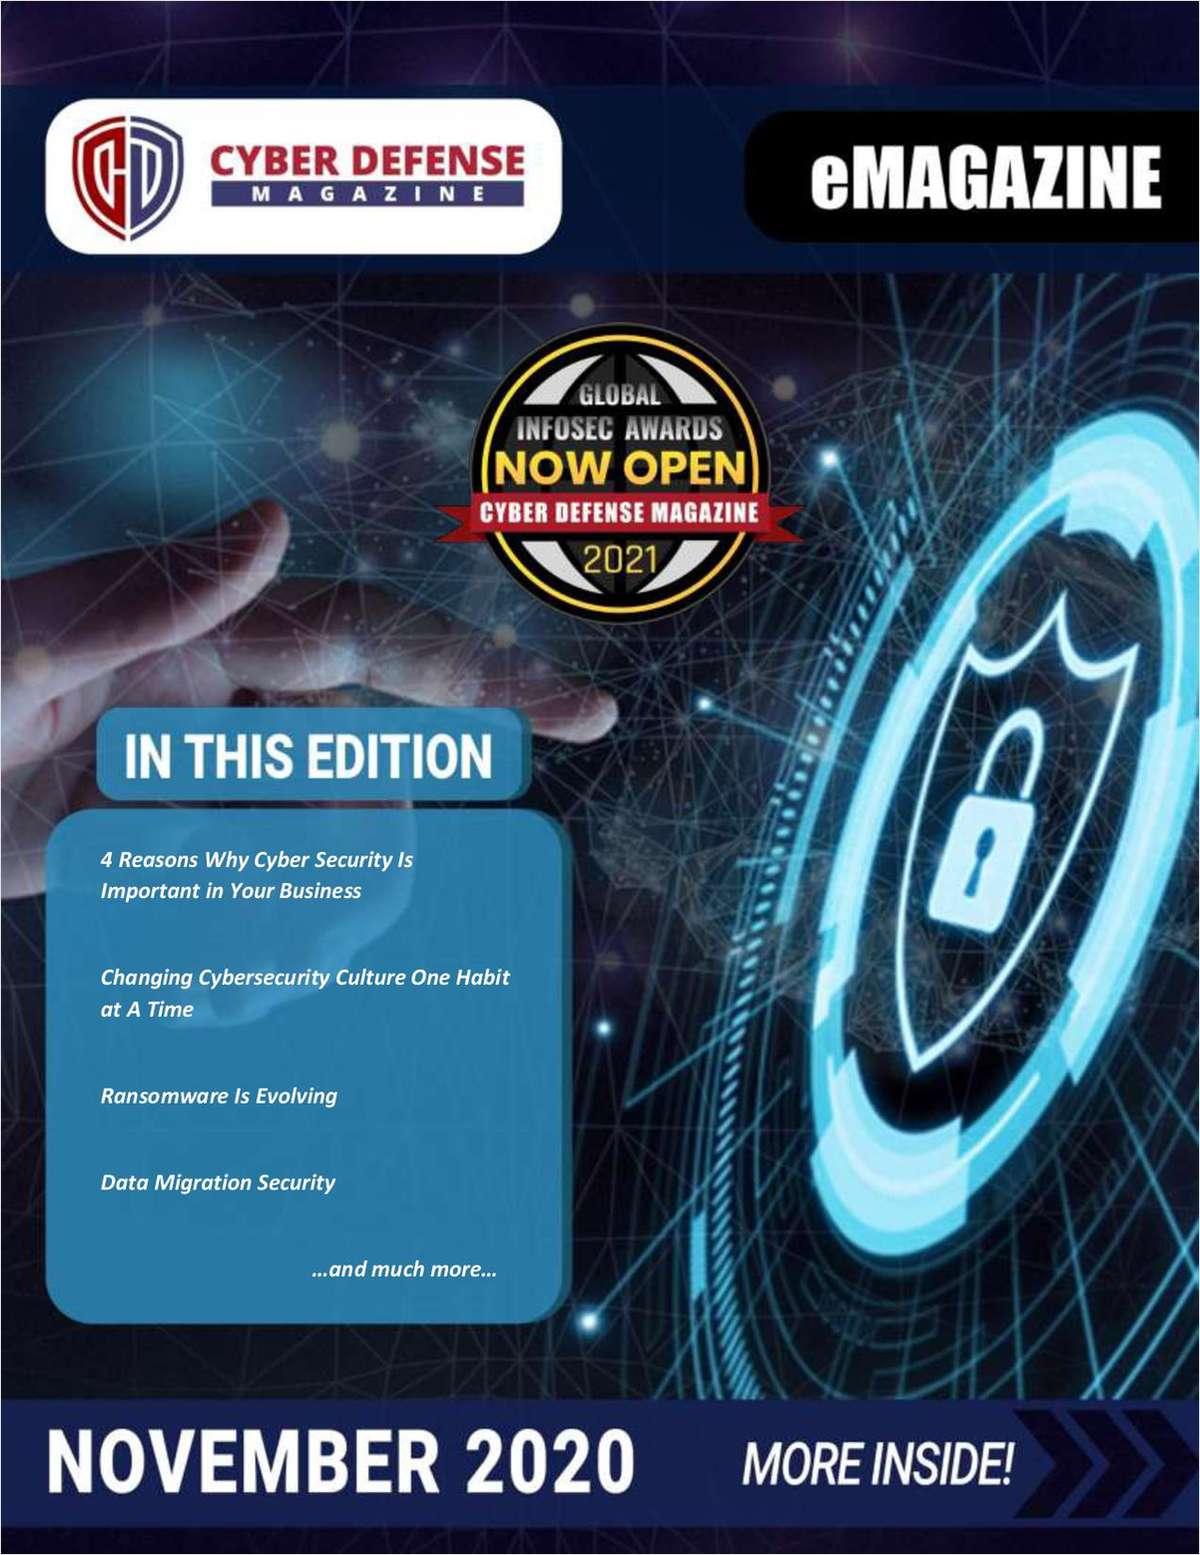 Cyber Defense Magazine November 2020 Edition